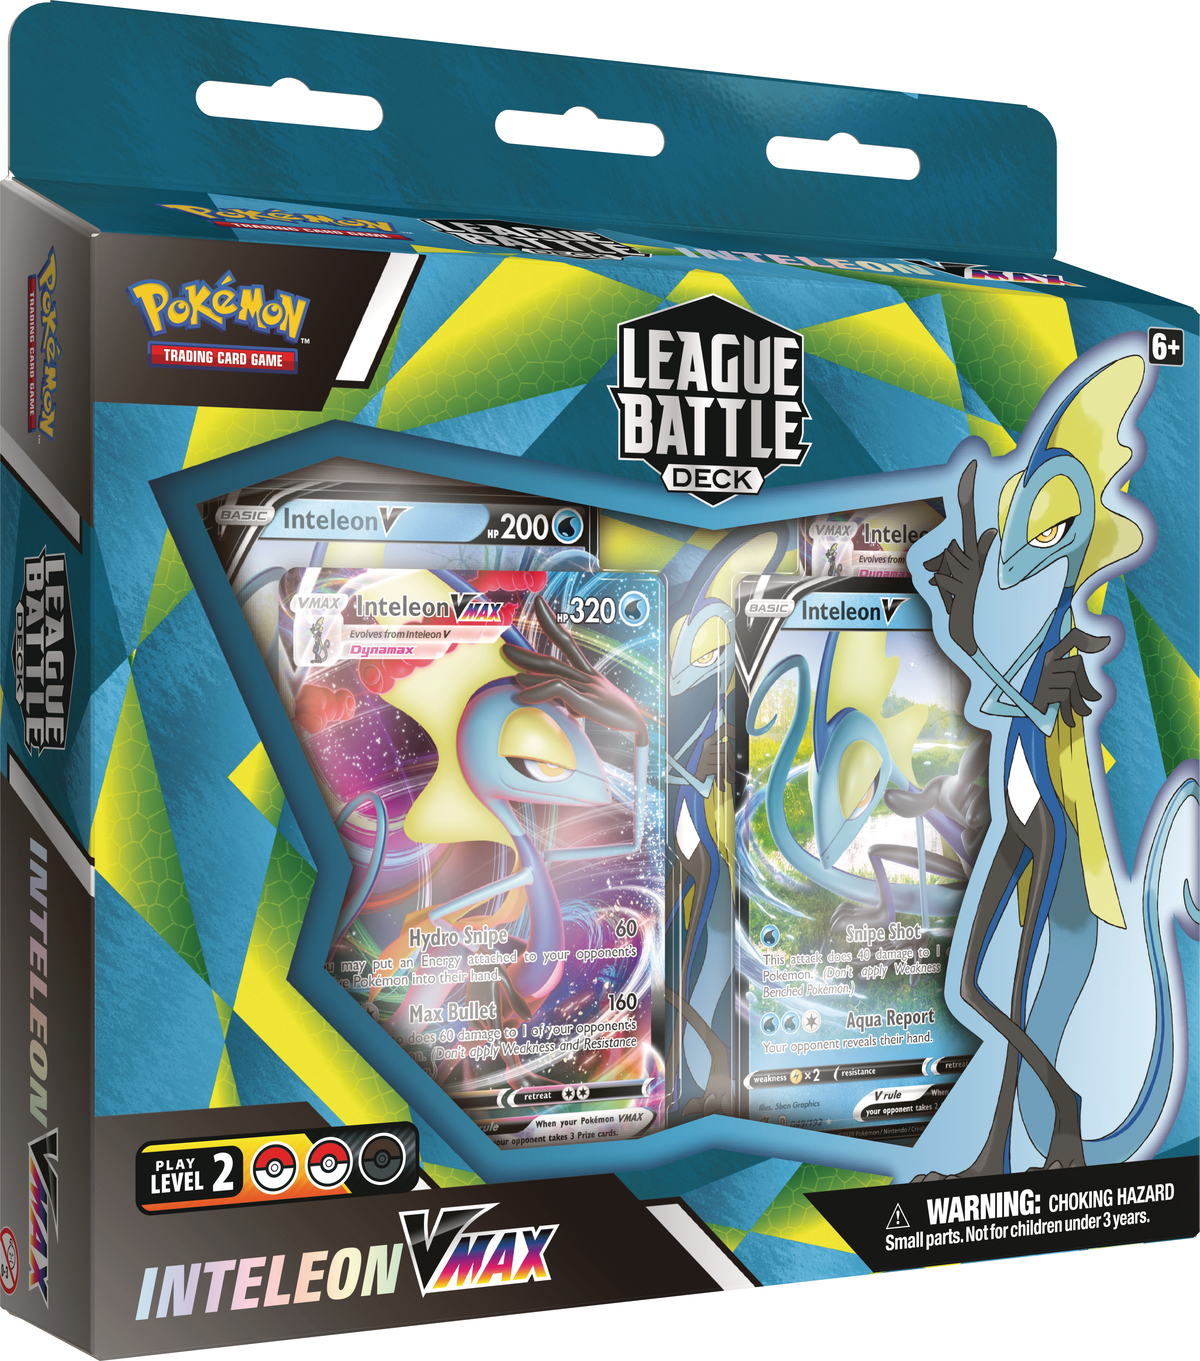 Pokemon: Inteleon VMAX League Battle Deck